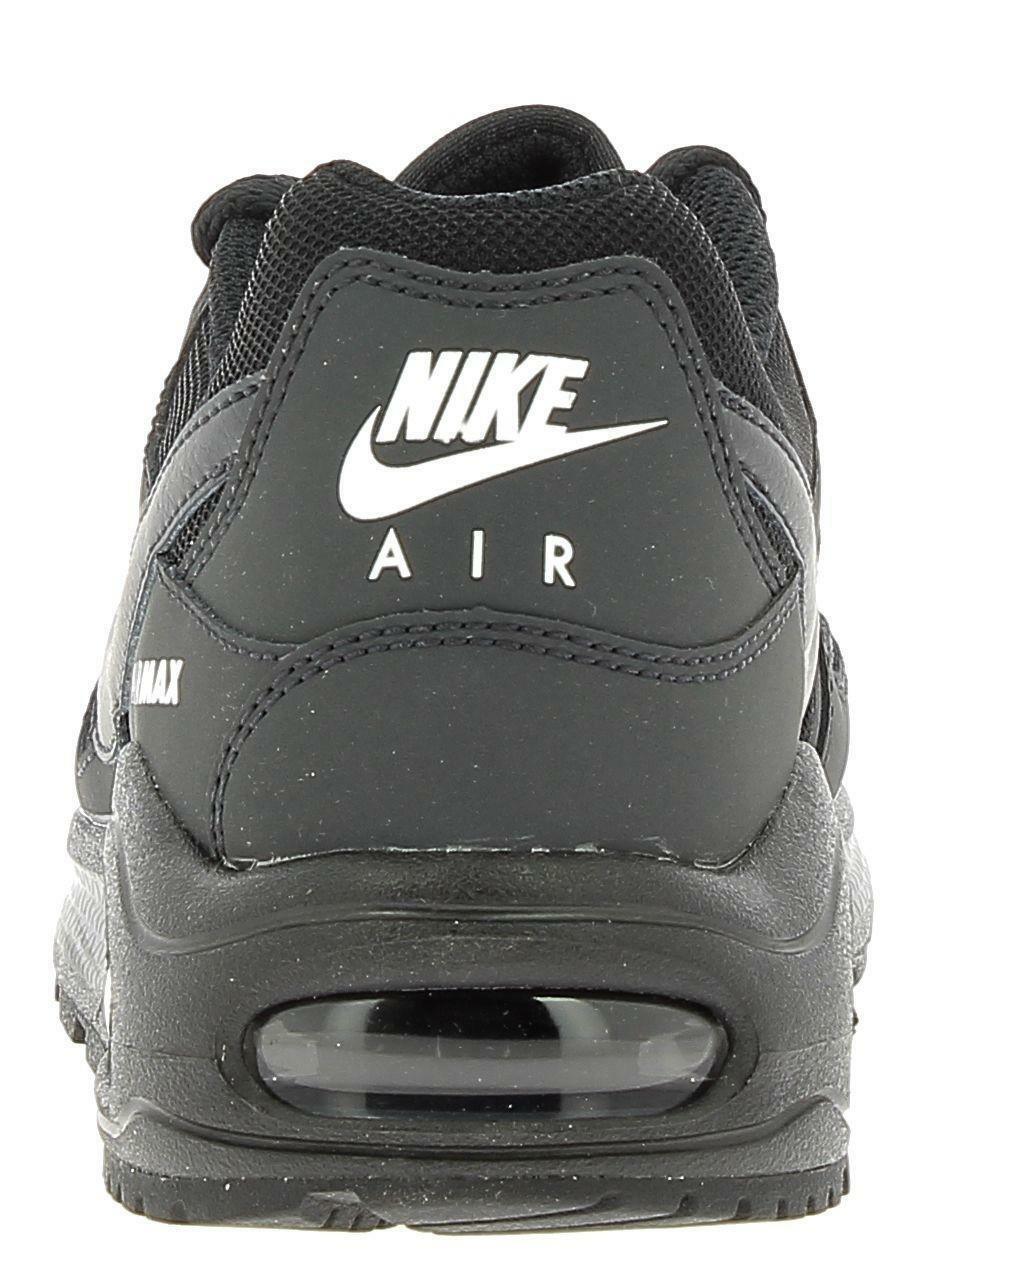 nike nike air max command flex (ps) scarpe sportive bamino nere